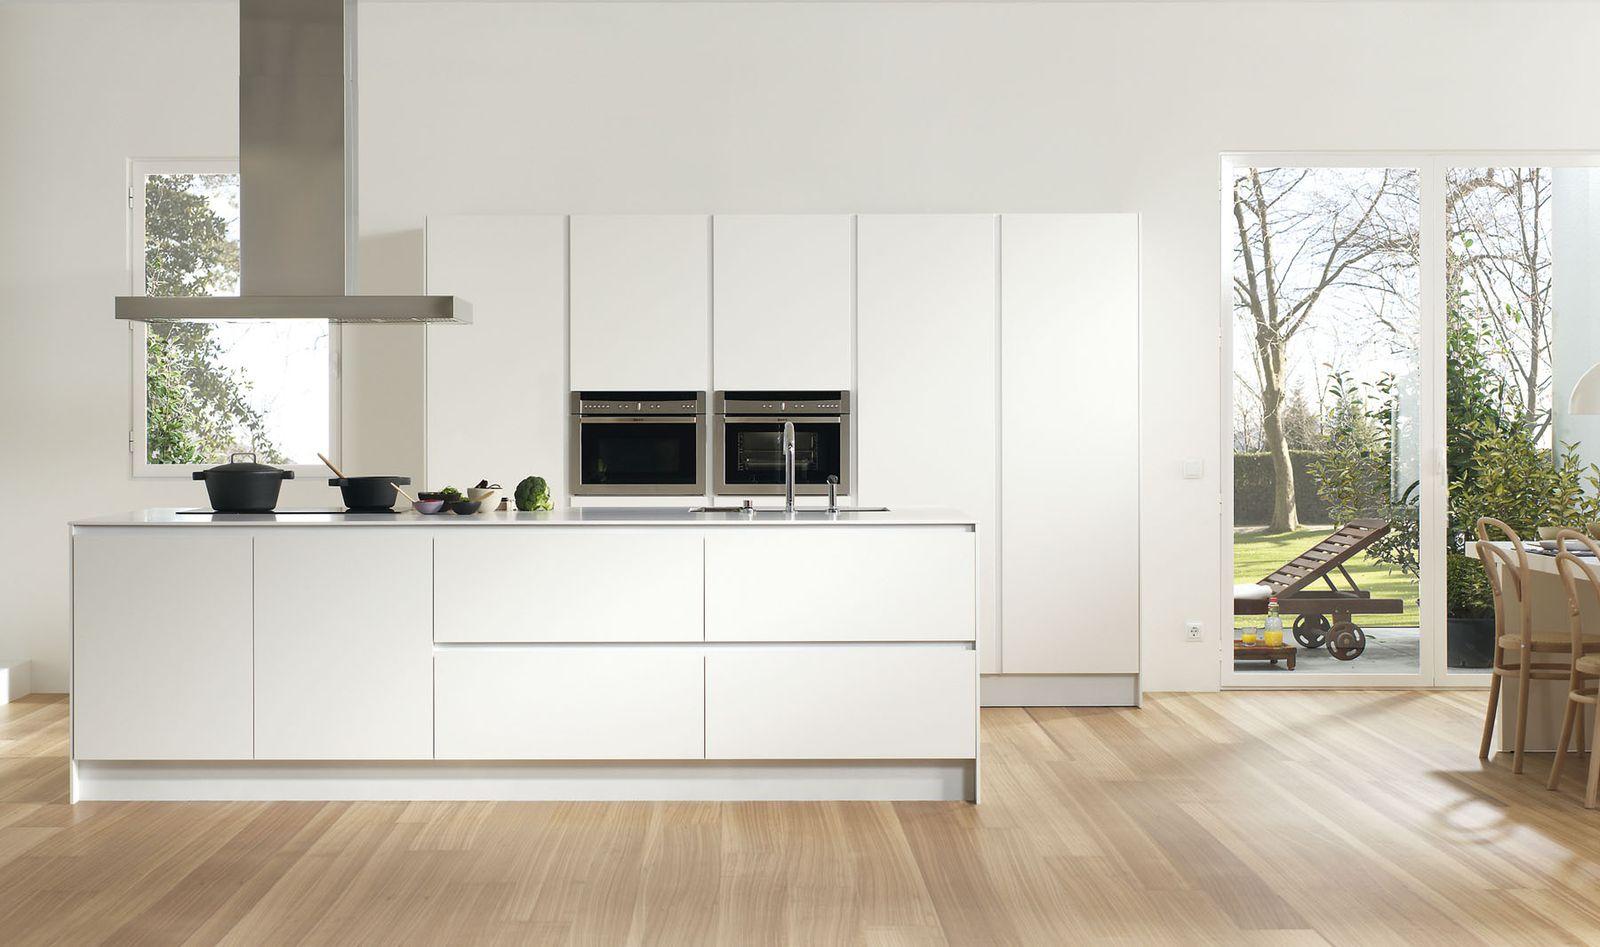 Muebles de cocina dica best joseba sukaldeak dica with for Muebles de cocina dica